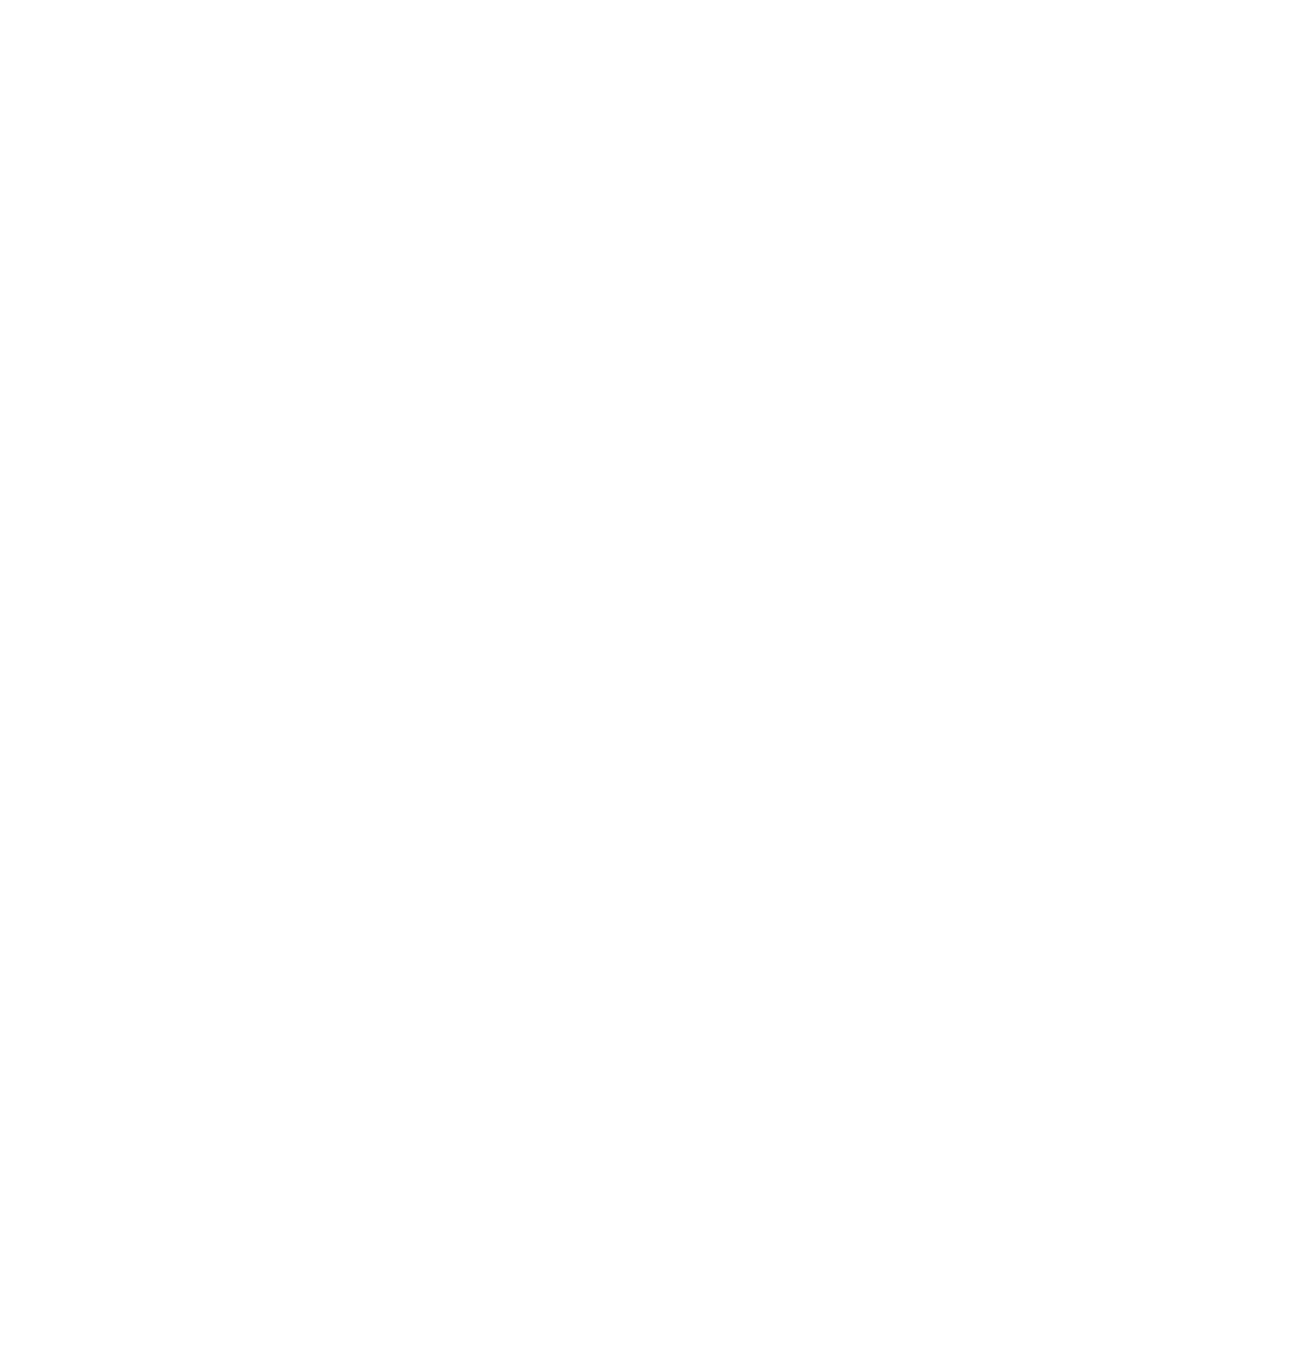 kcr-logo-white